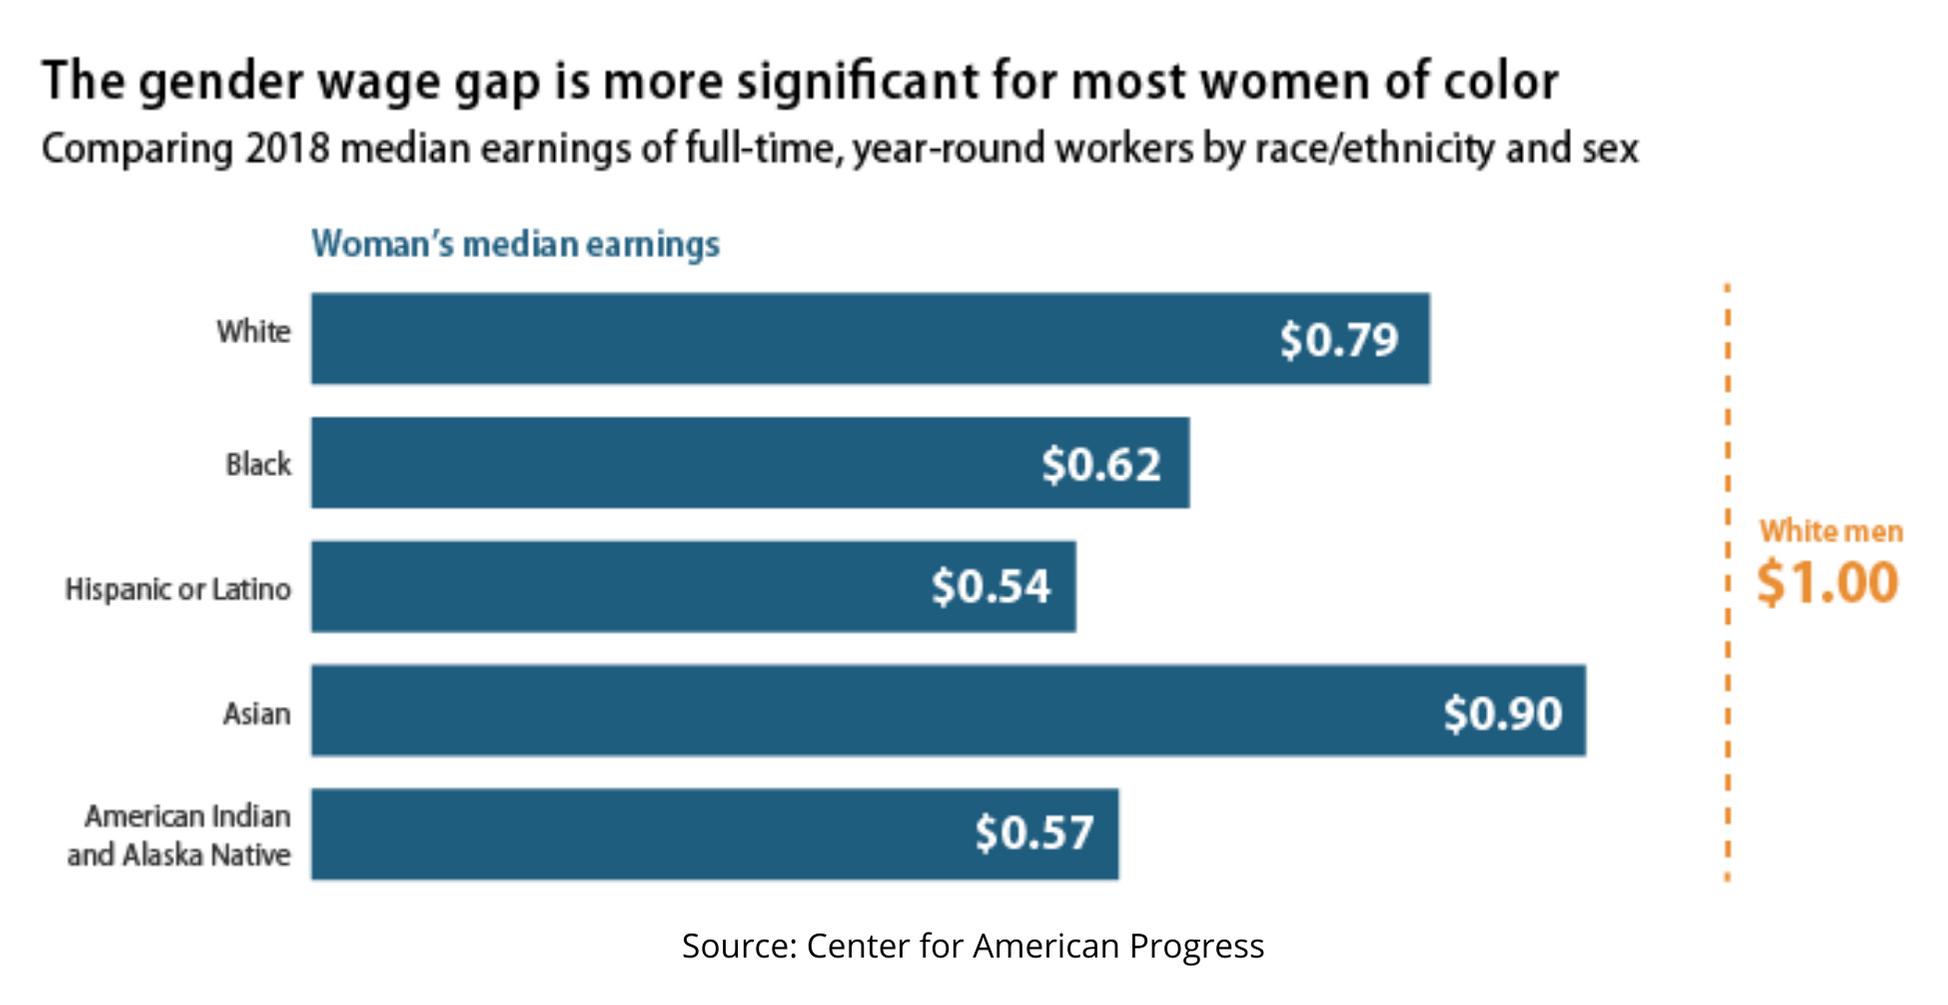 Graph of gender wage gap broken down by race/ethnicity.